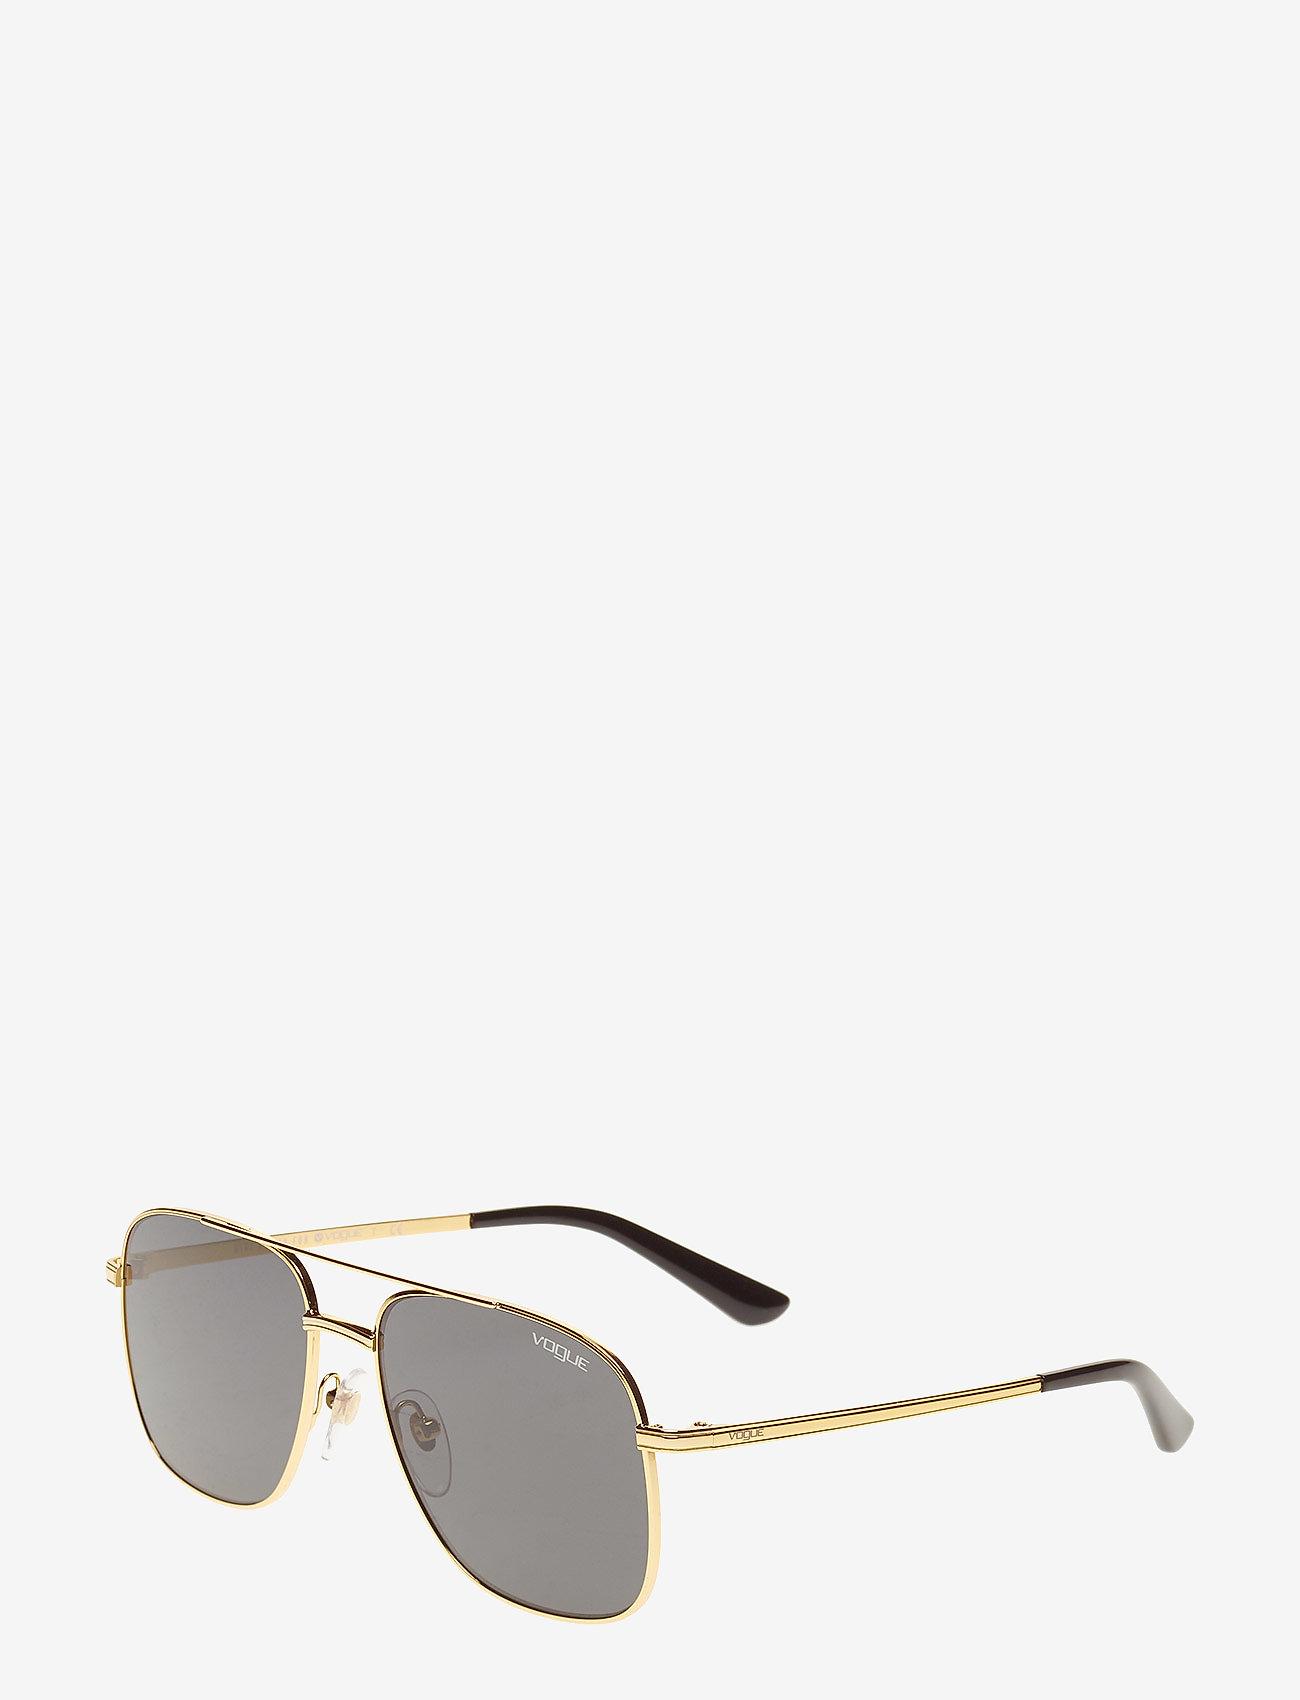 Vogue Eyewear - WOMEN'S SUNGLASSES - pilot - gold/grey - 1